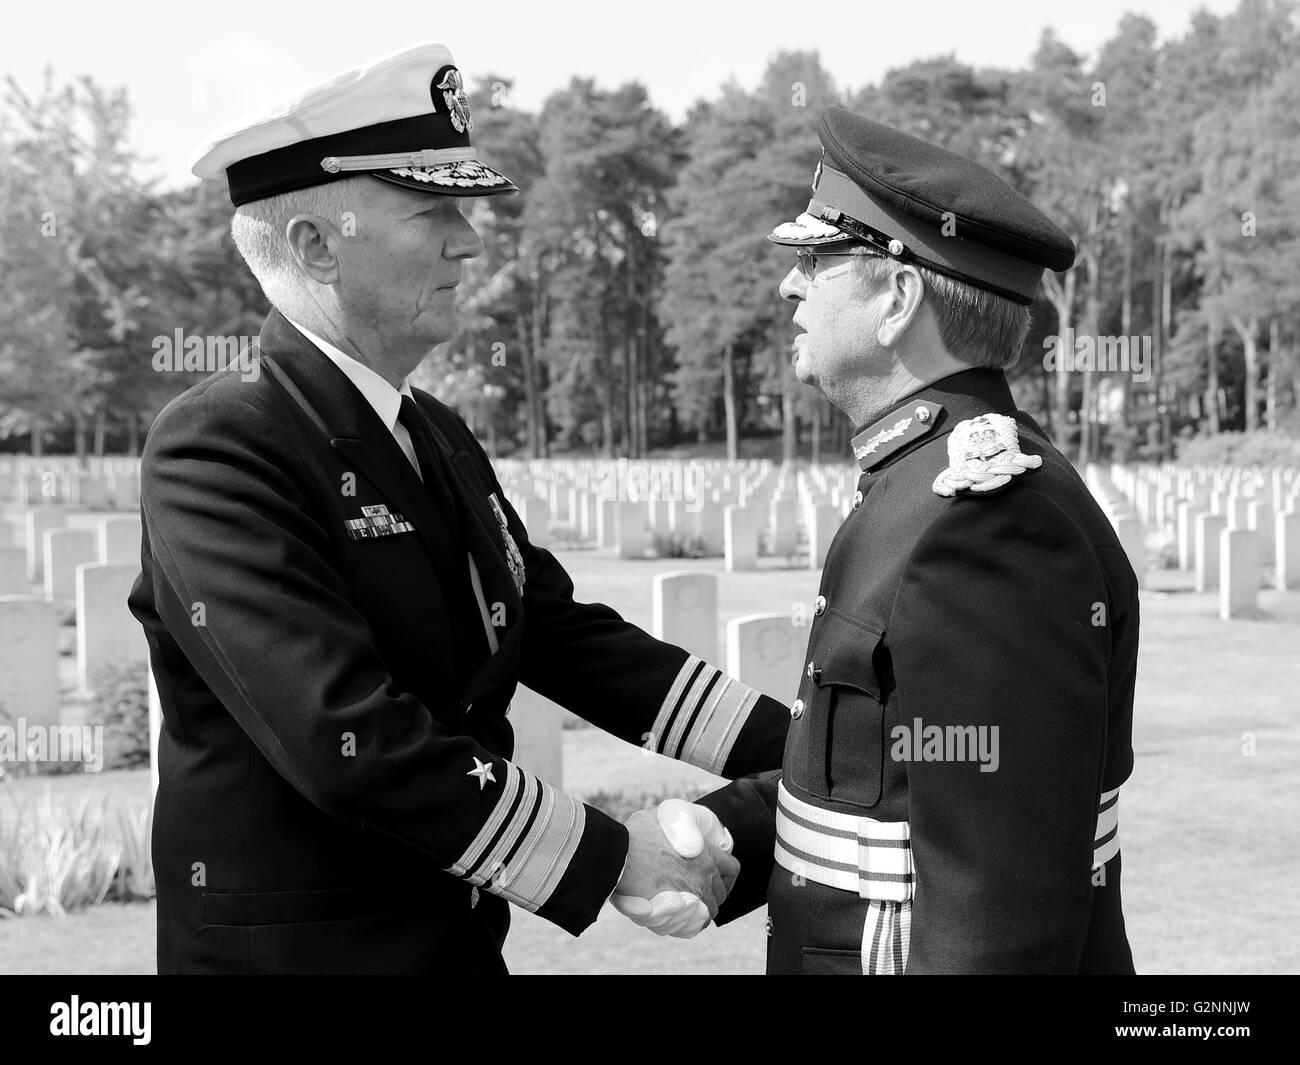 VADM James G. Foggo III Commander US 6th Fleet with HM Lord-Lieutenant of Surrey Michael More-Molyneux - monochrome Stock Photo